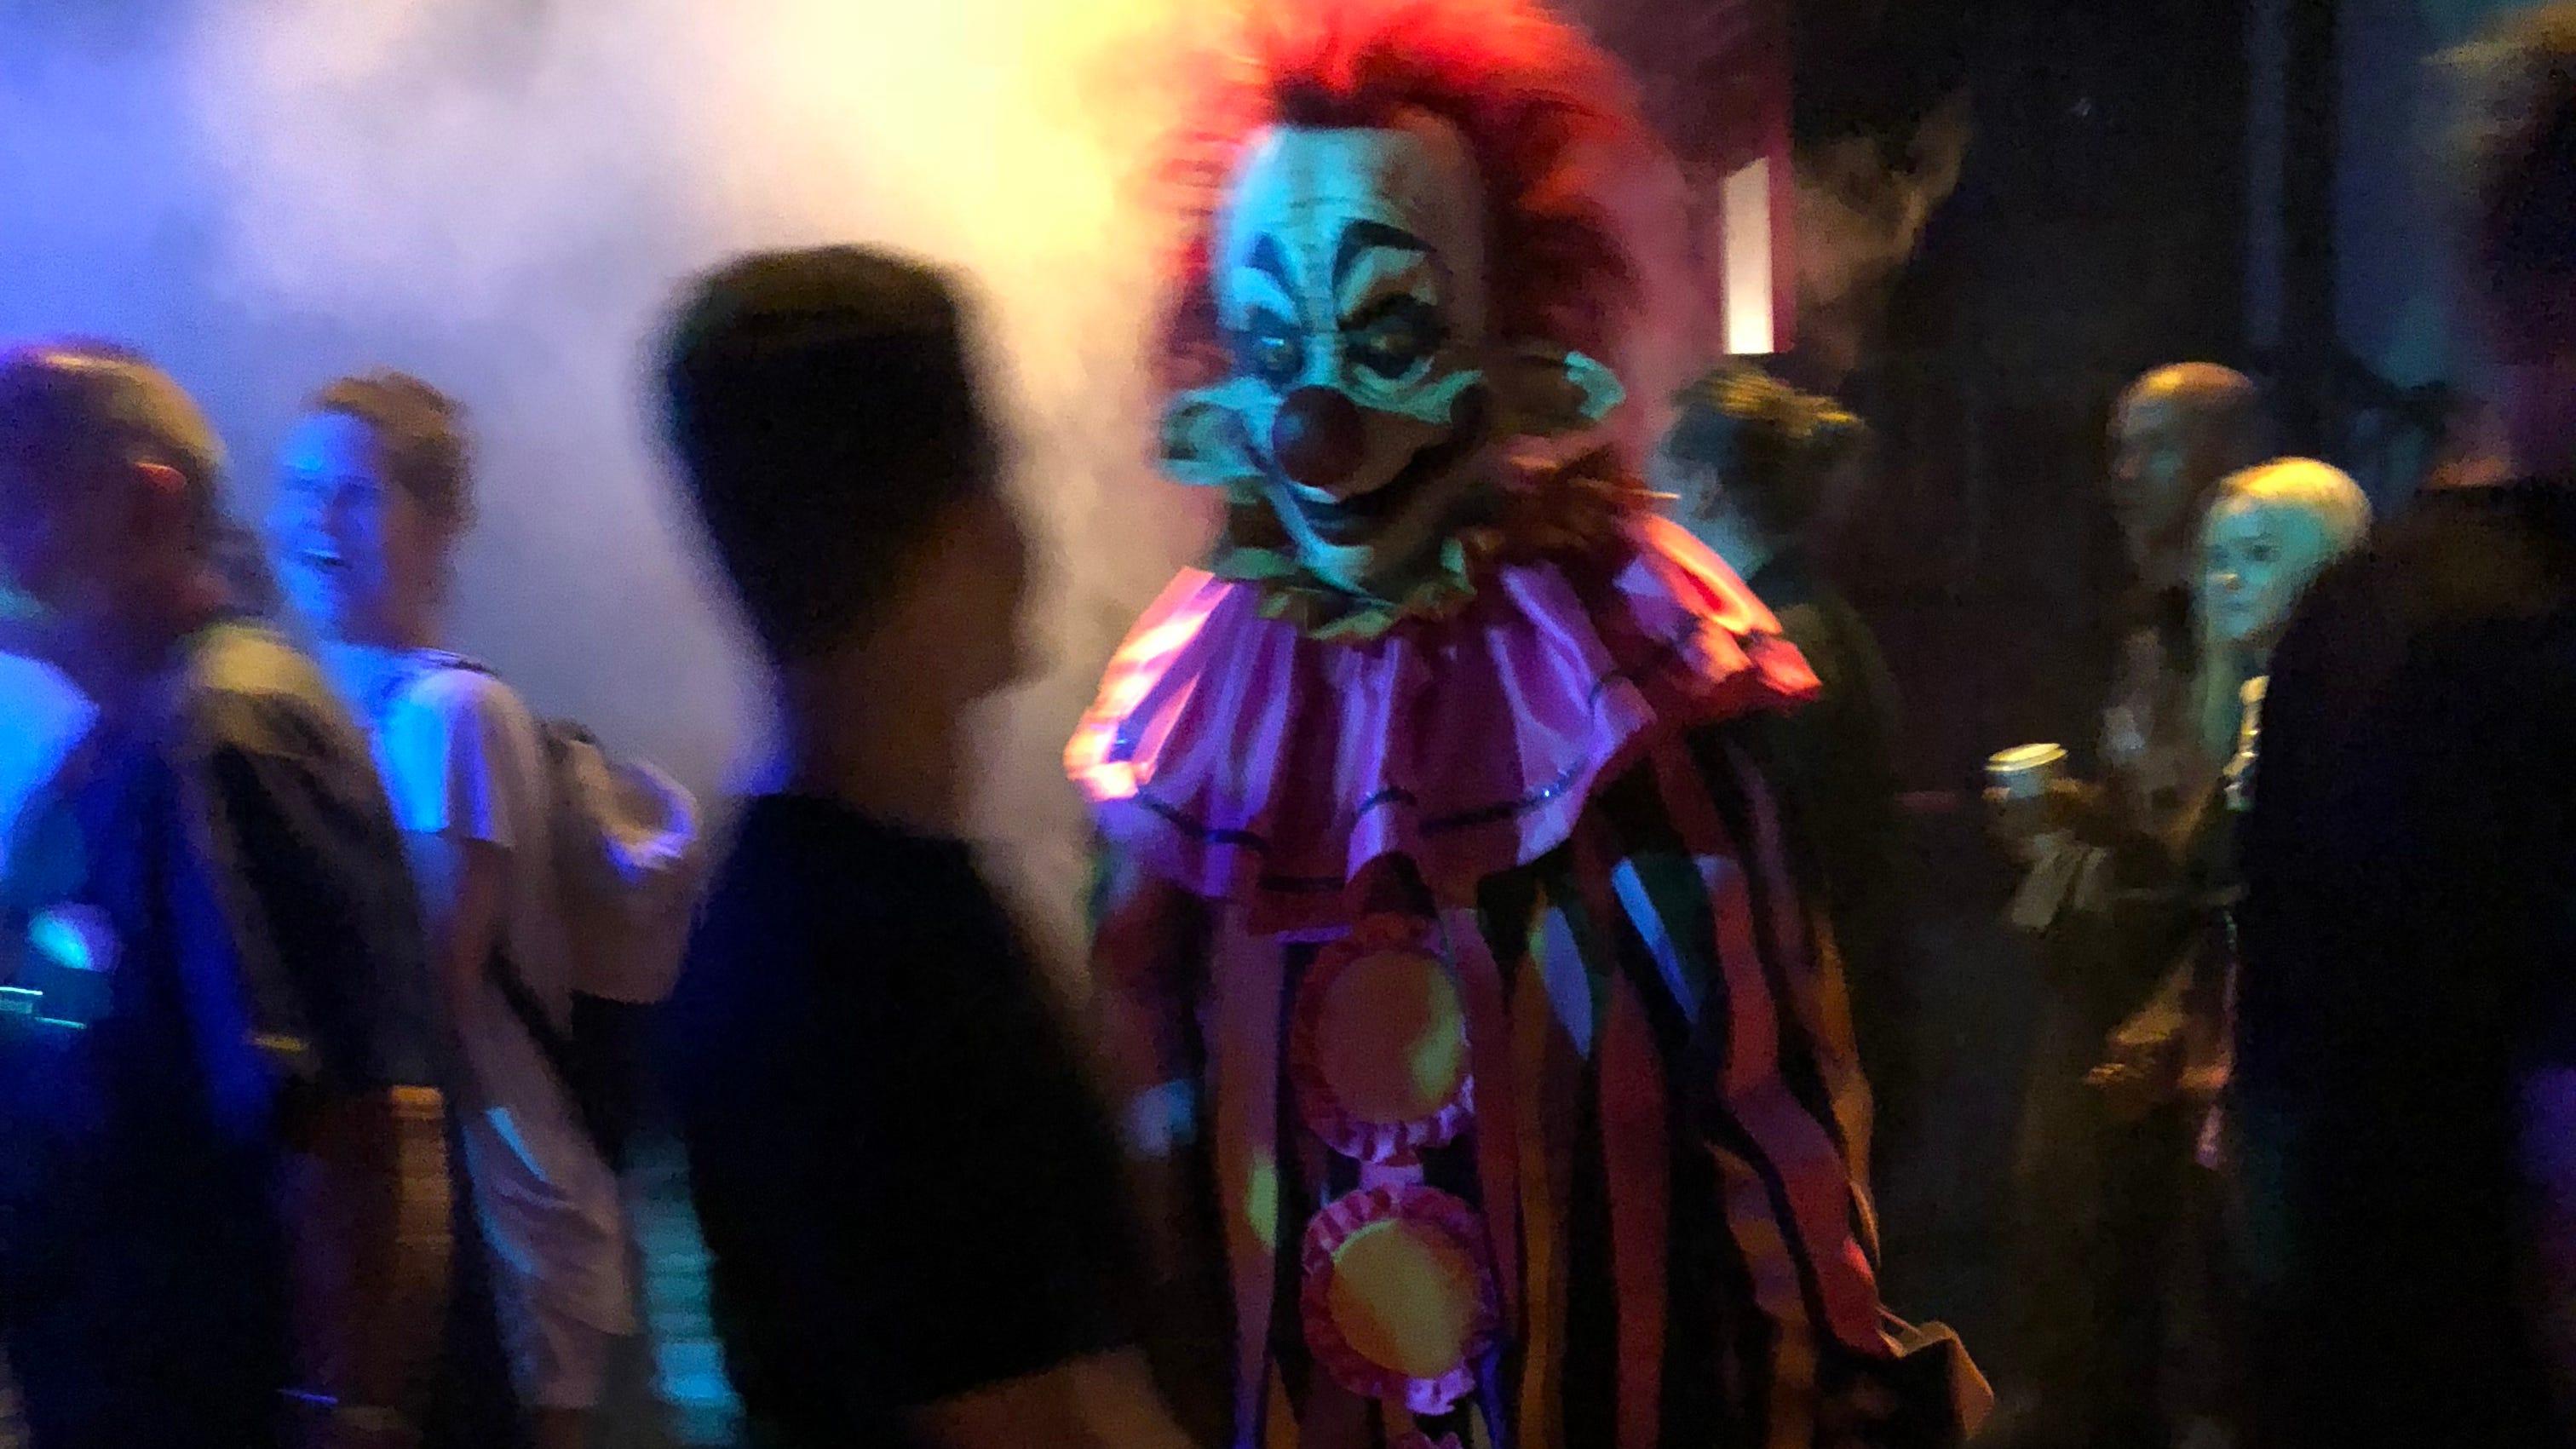 halloween horror nights 2018 at universal orlando: a big '80s throwback